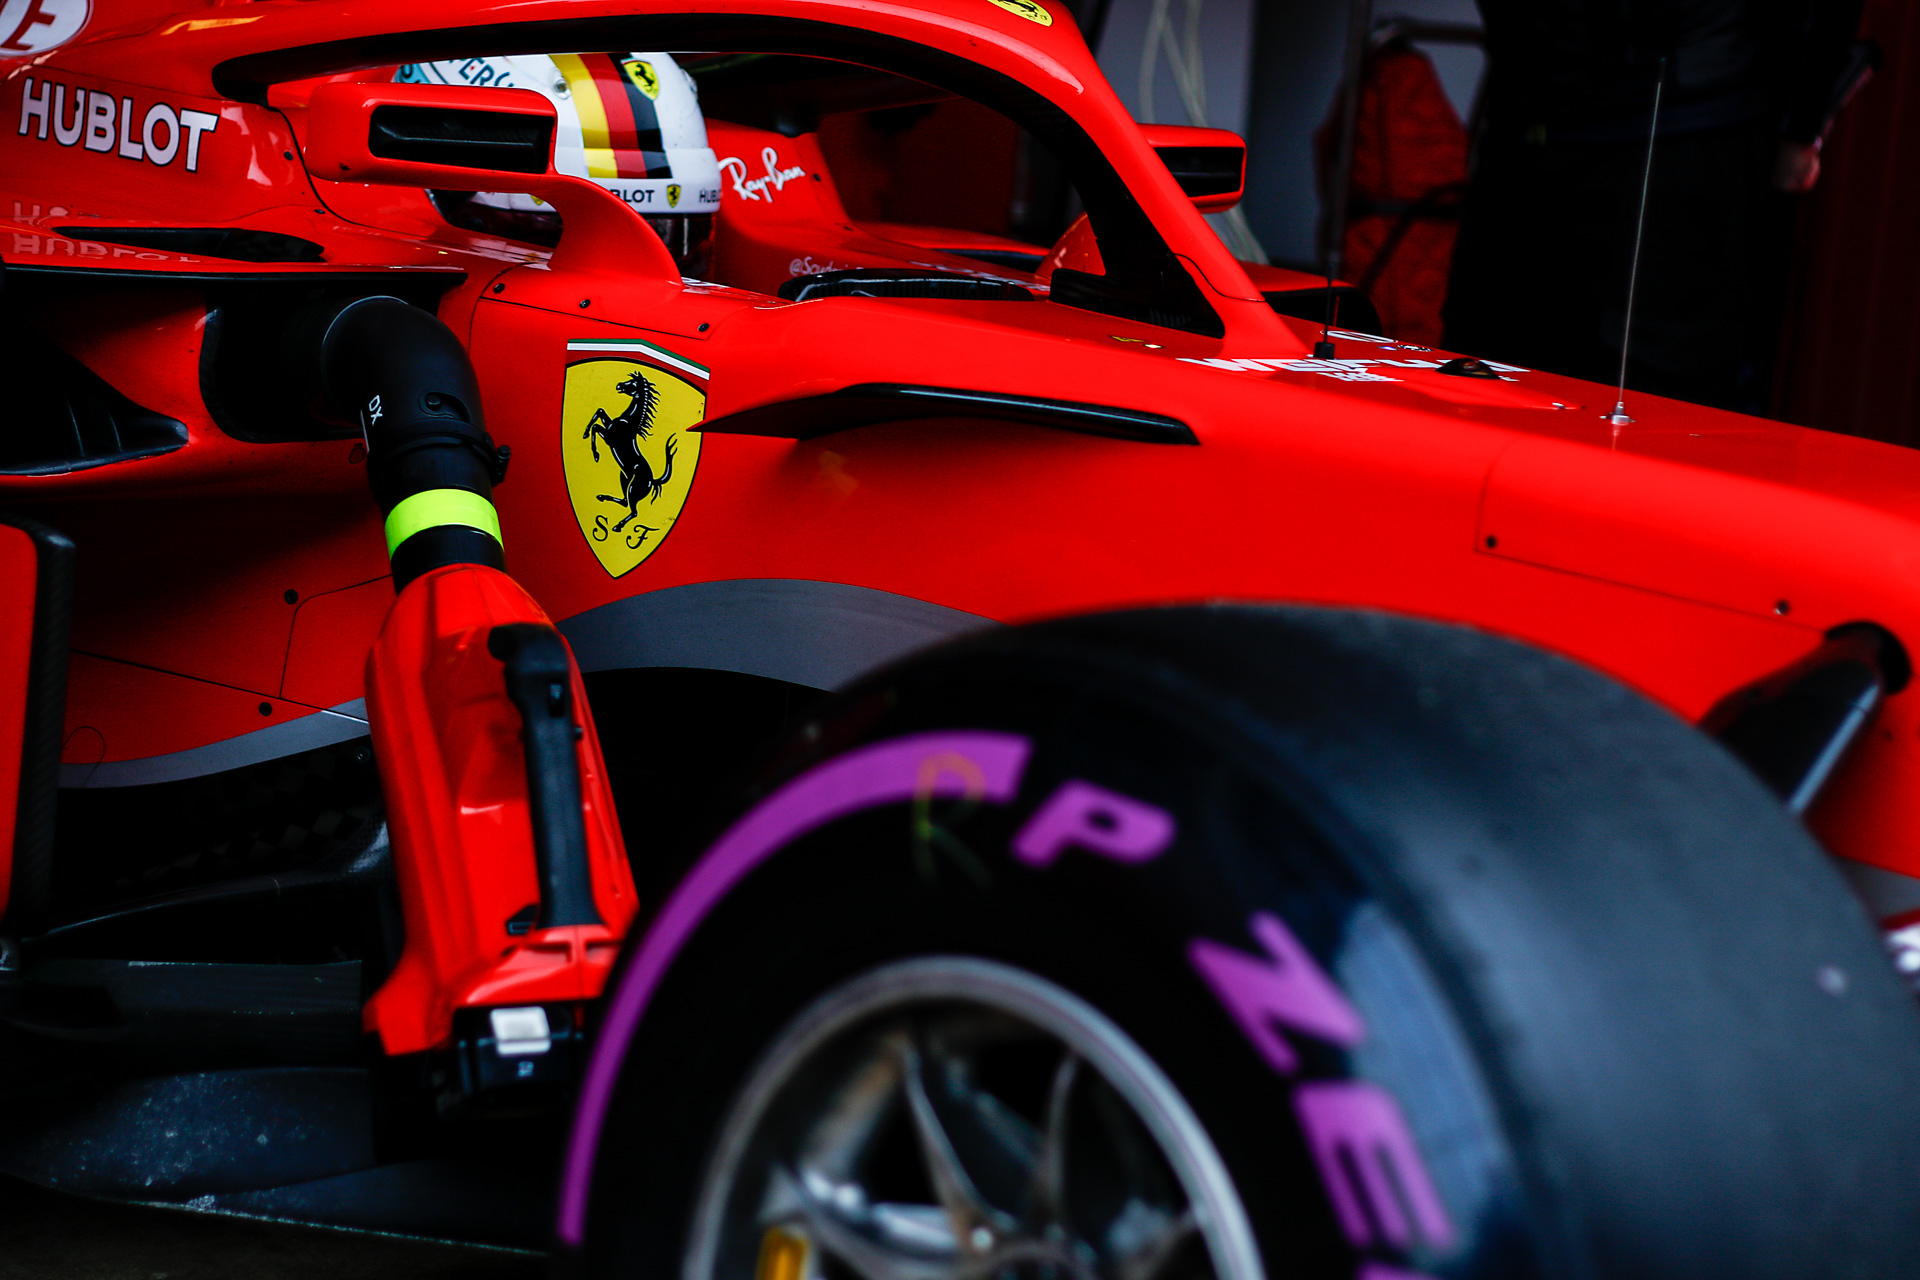 Sebastian VETTEL - Germany - SCUDERIA FERRARI - #05 - F1 Test Days - Circuit de Barcelona Catalunya - Spain - 08 March 2018